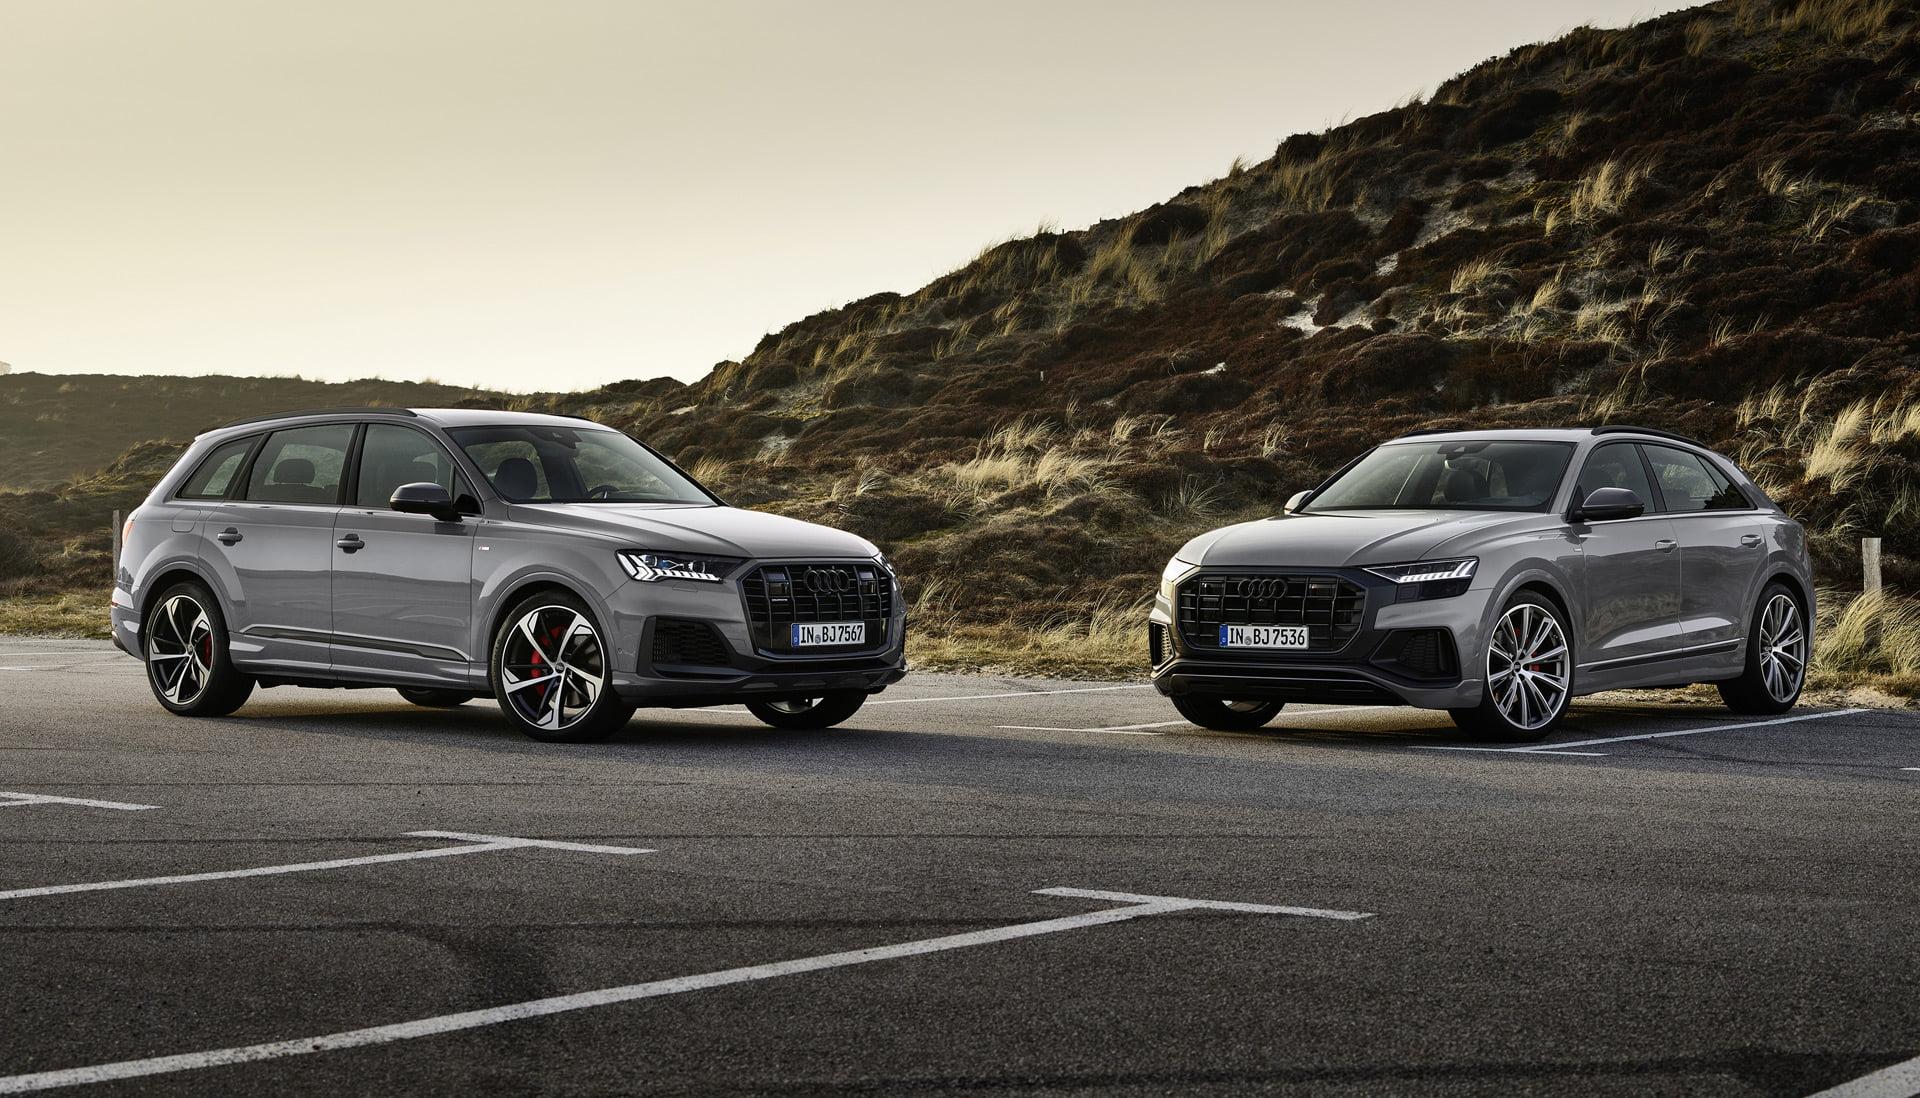 Audi Q7 y Q8 2022 generan modelos Competition Plus